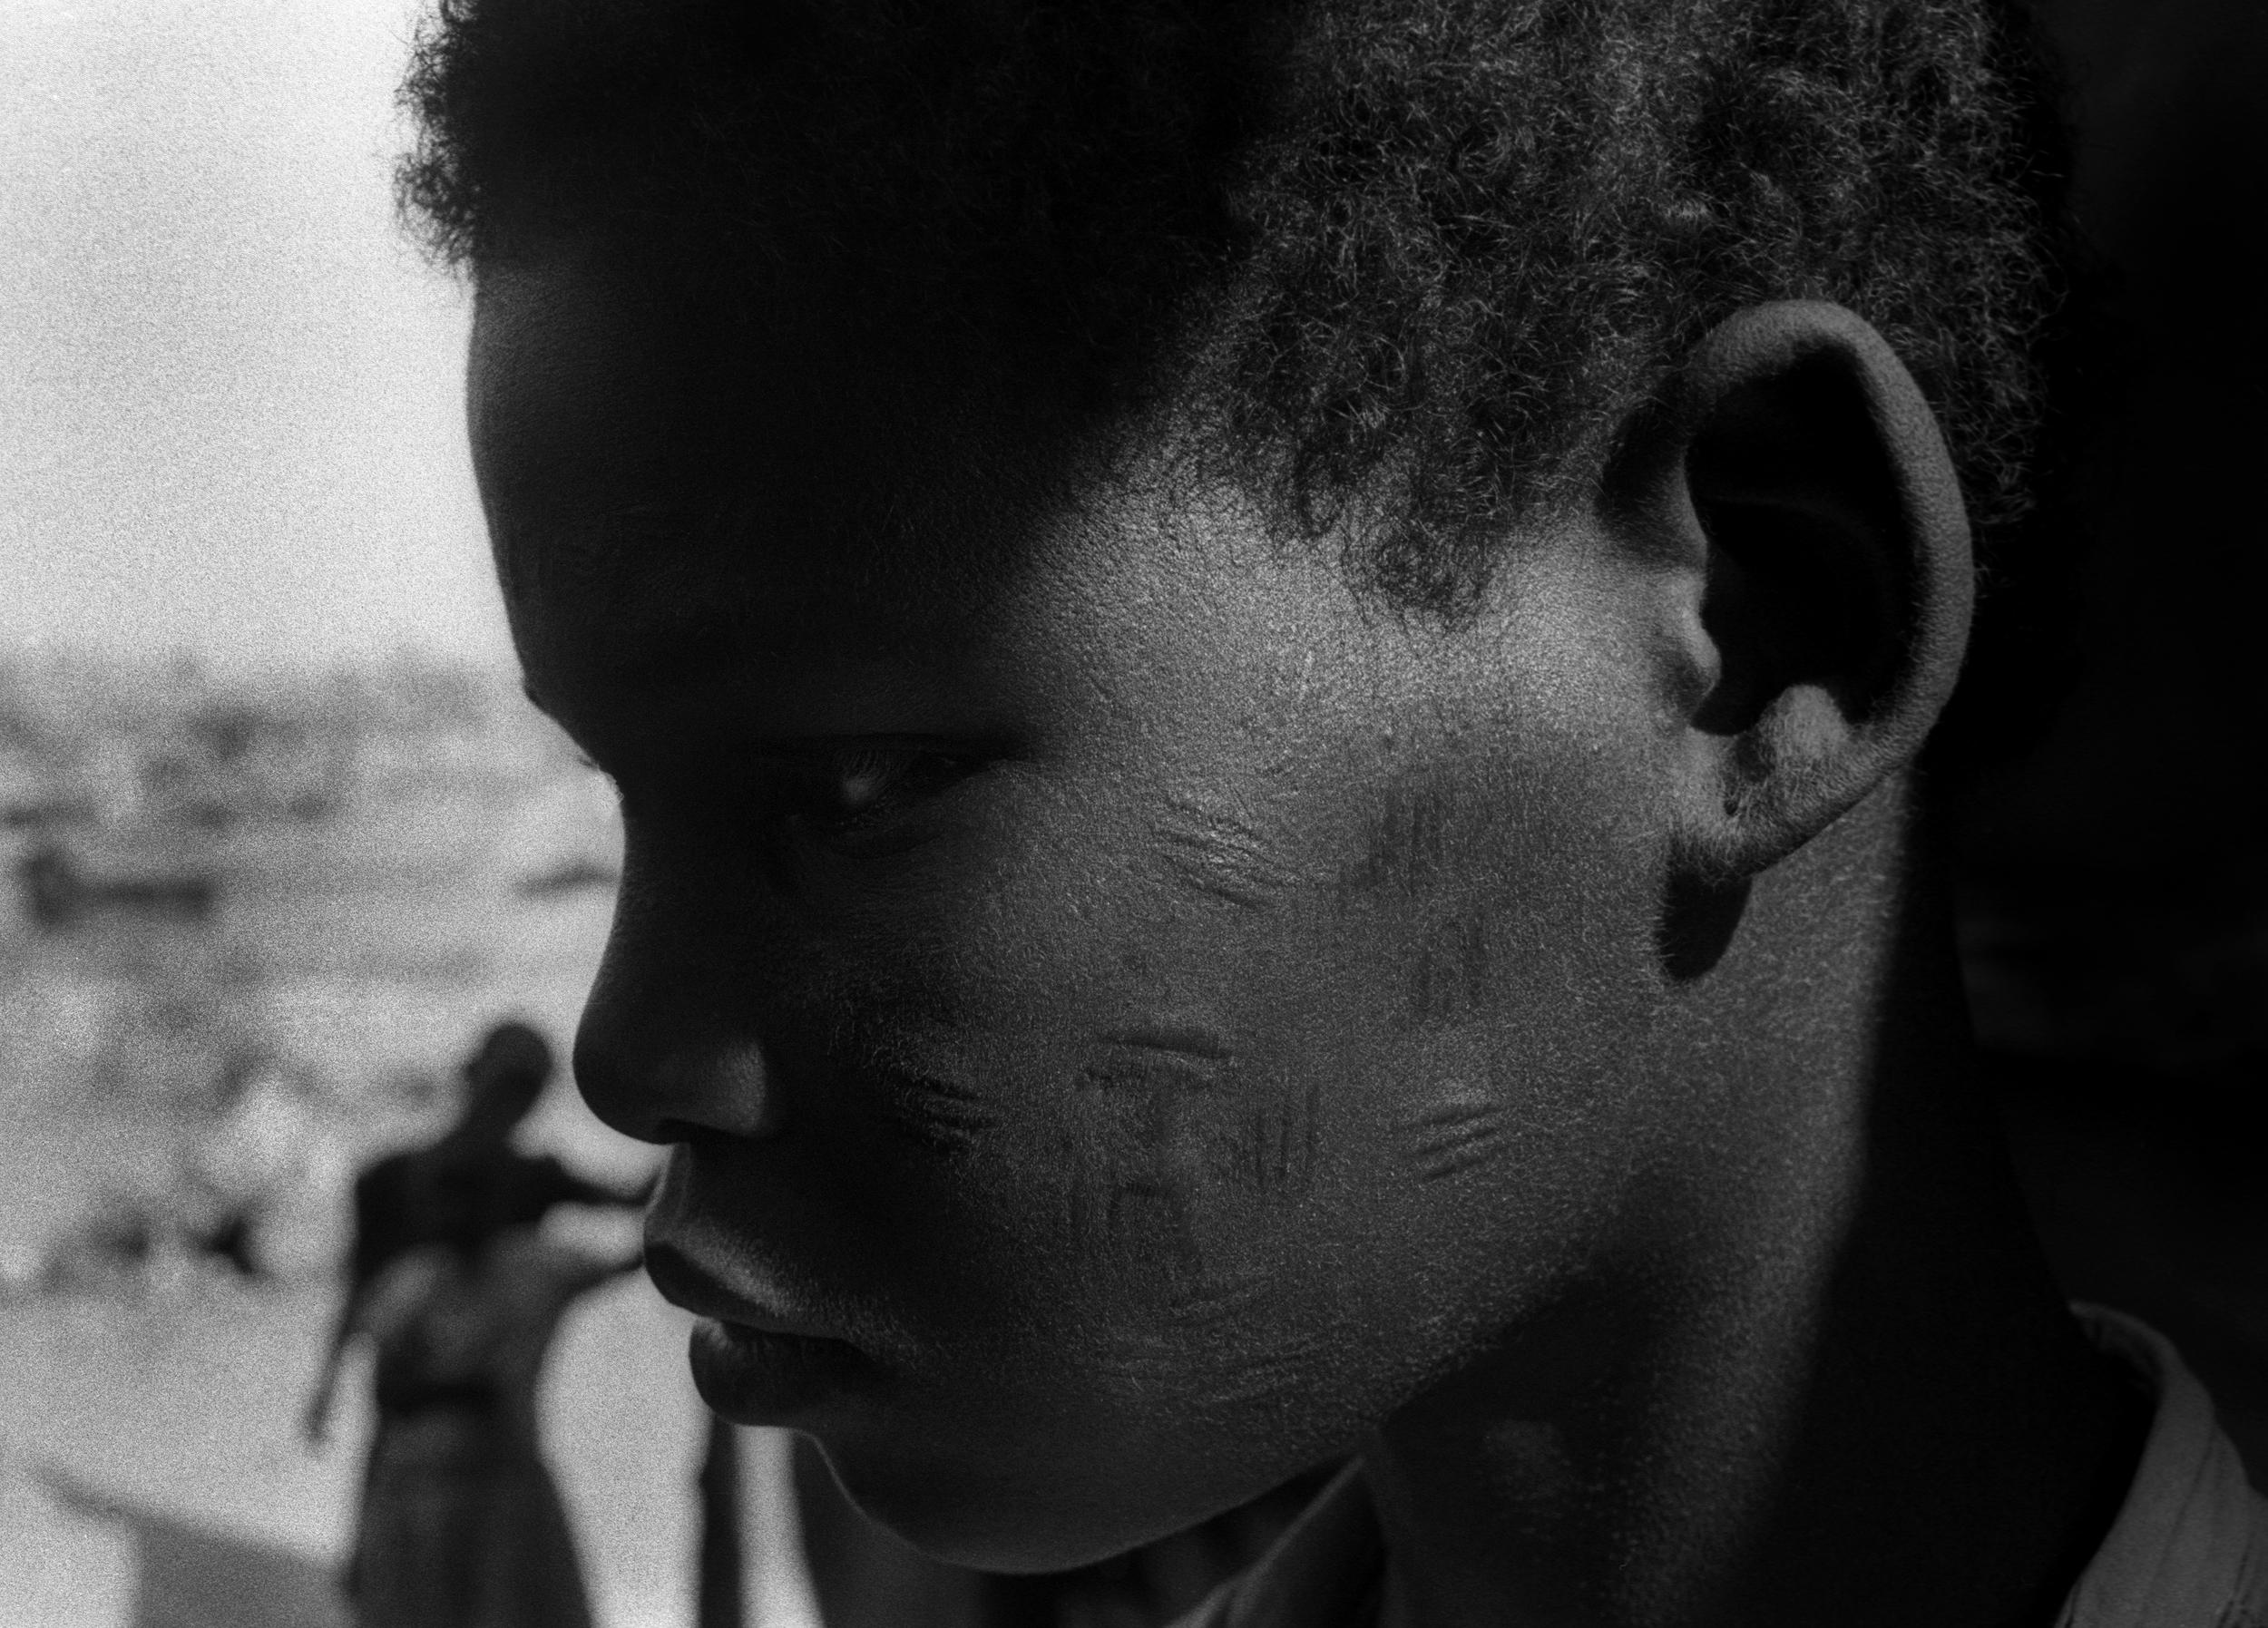 Mozambican refugee